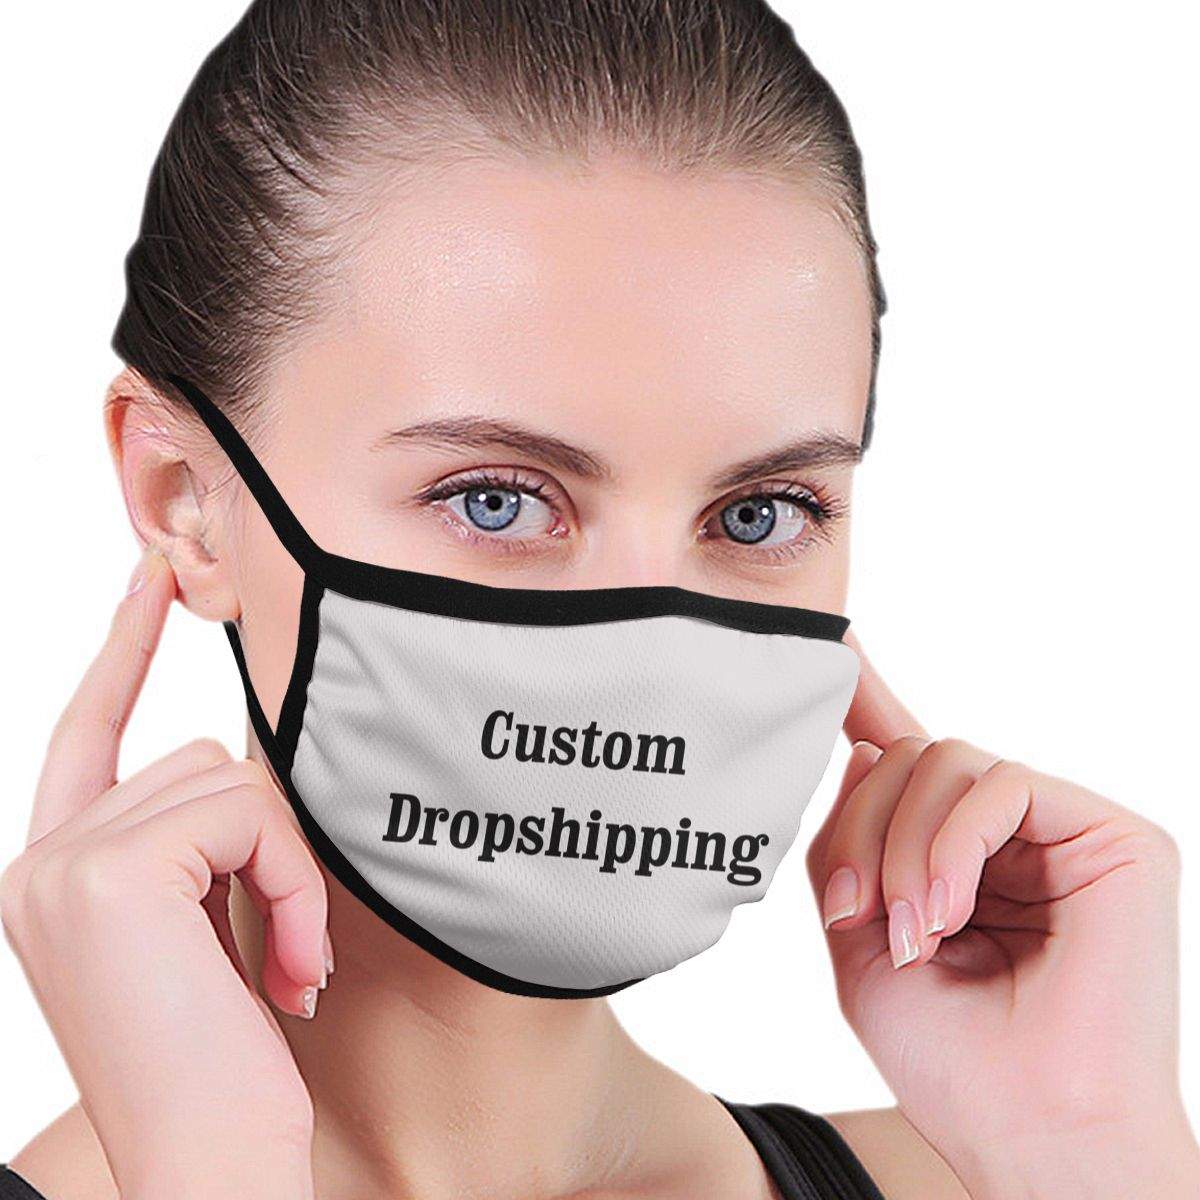 Brand Mask Outdoor Mascarillas Respirator Keep Warm Custom Masks Winter Anti Dust Unisex Fashion Black Border Dropshipping